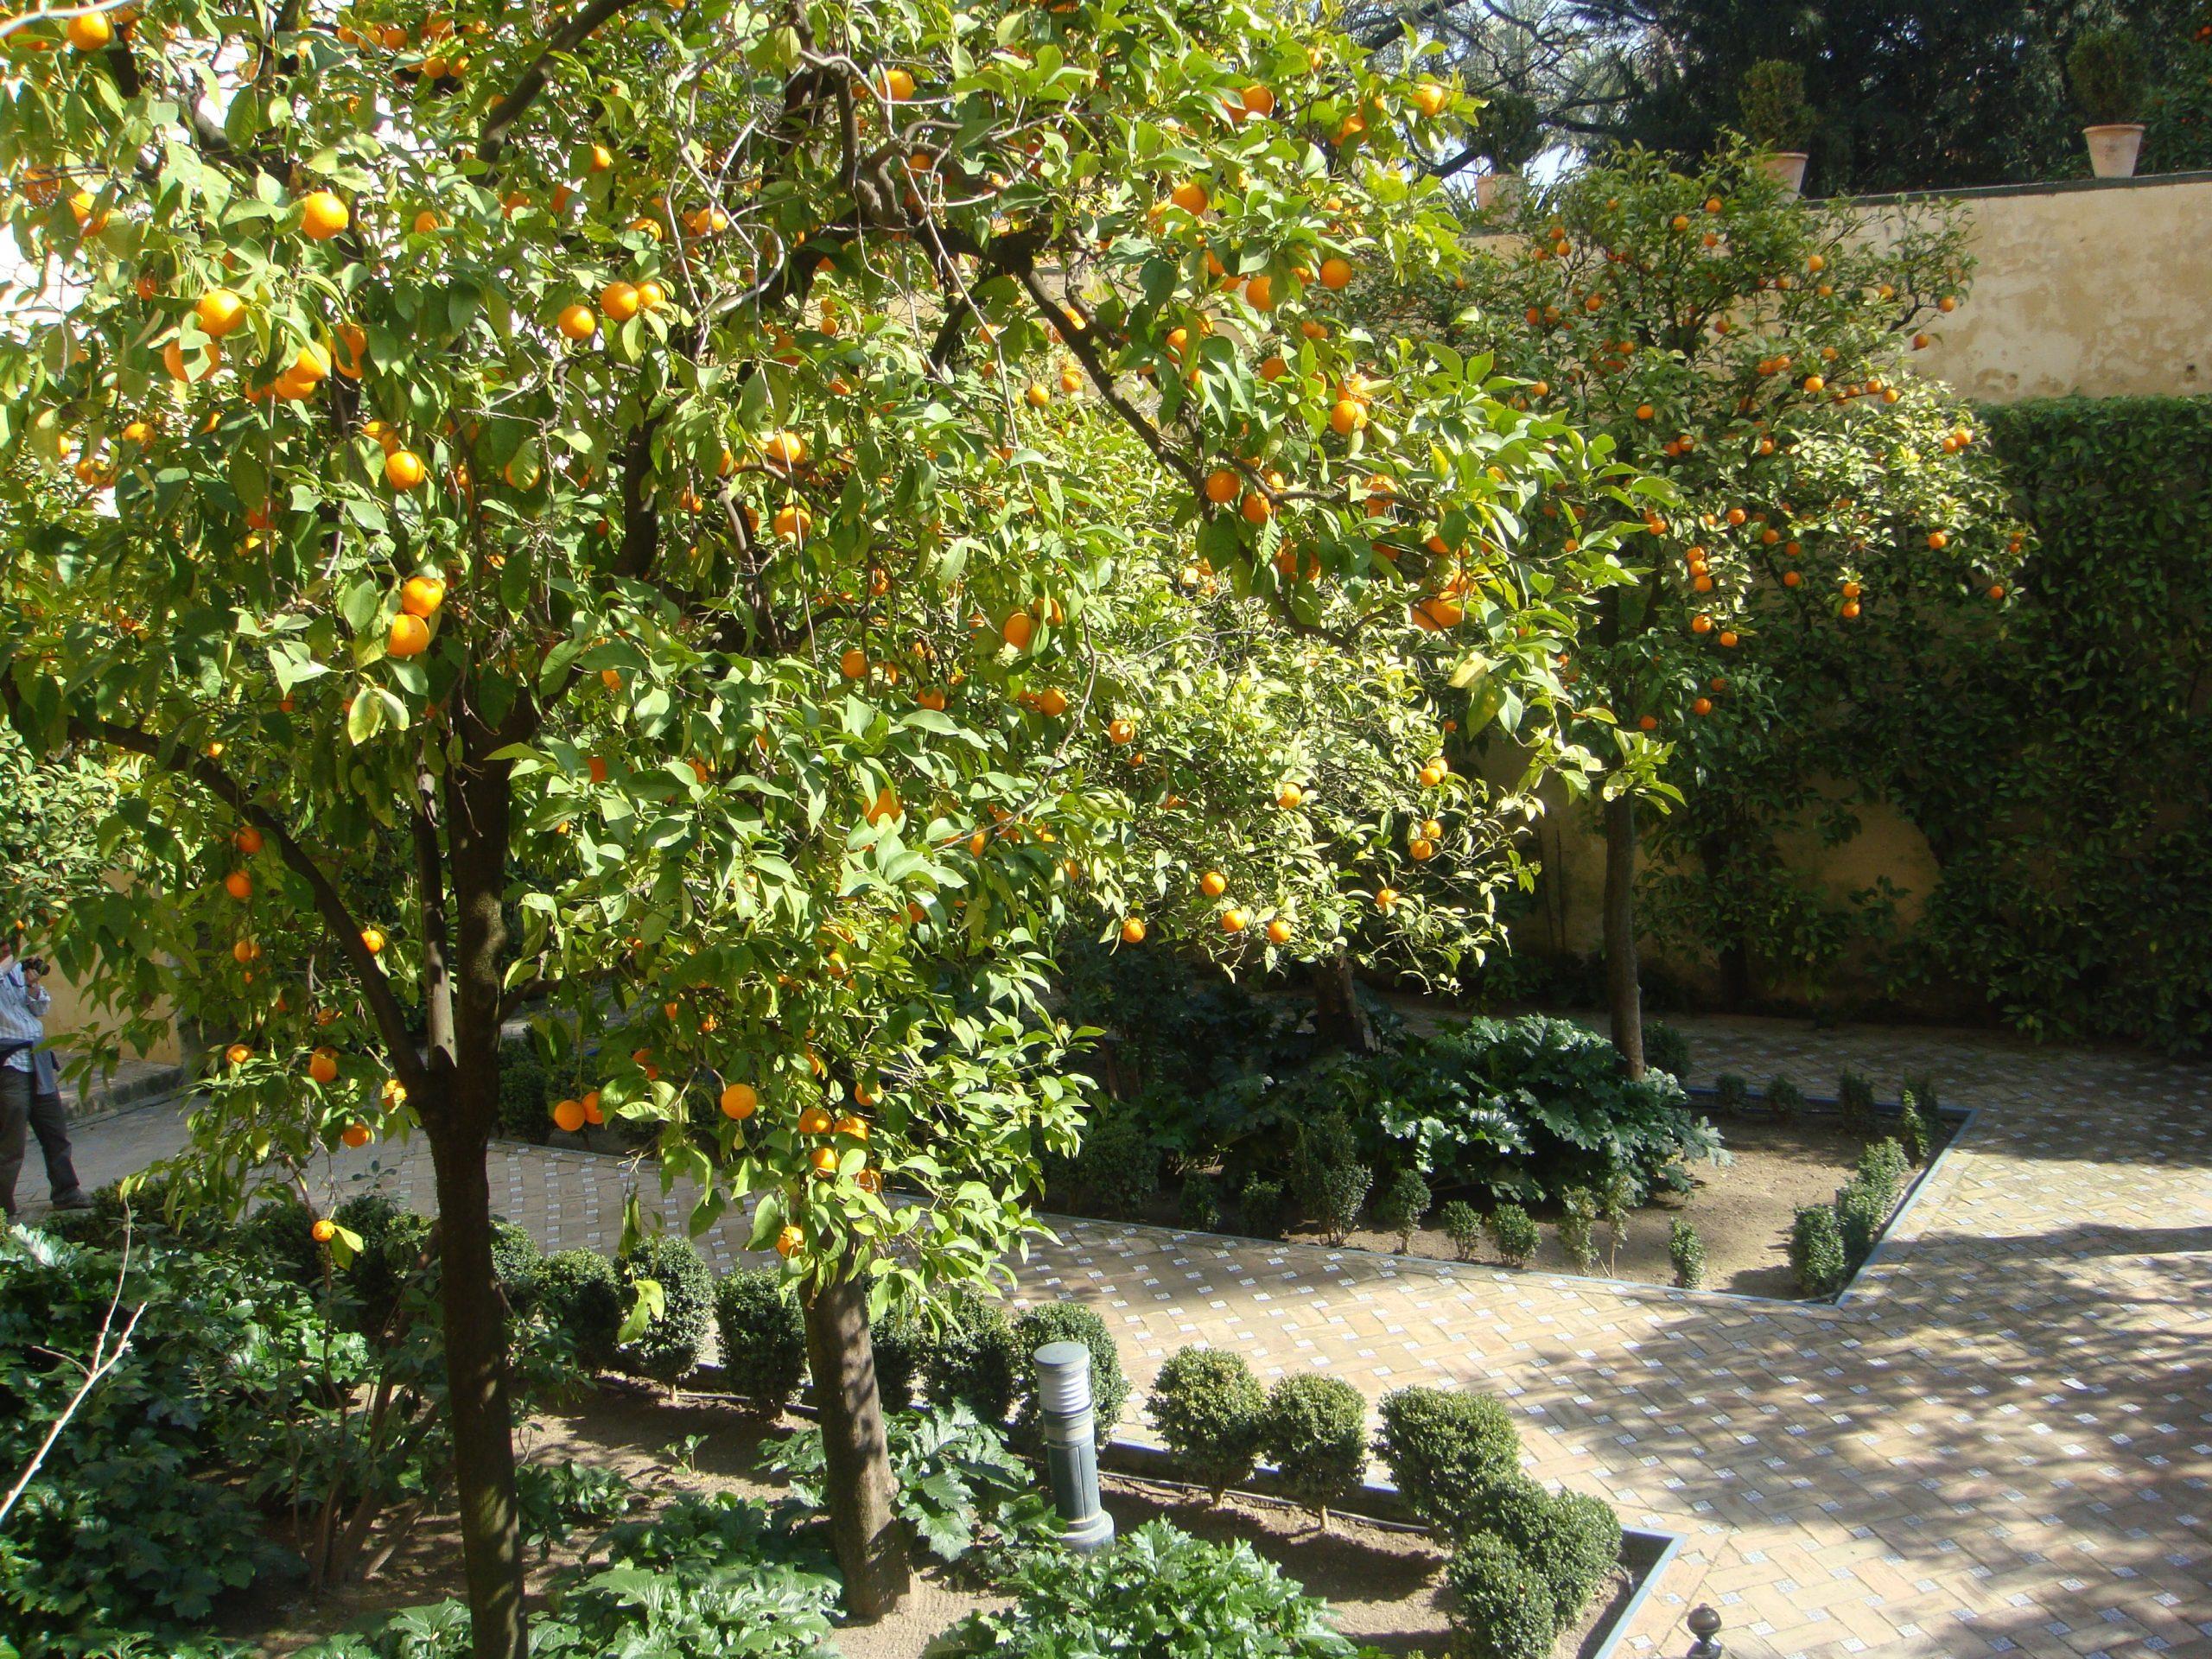 Garden Of The Galley (Jardín De La Galera) - Seville pour Delimitation Jardin